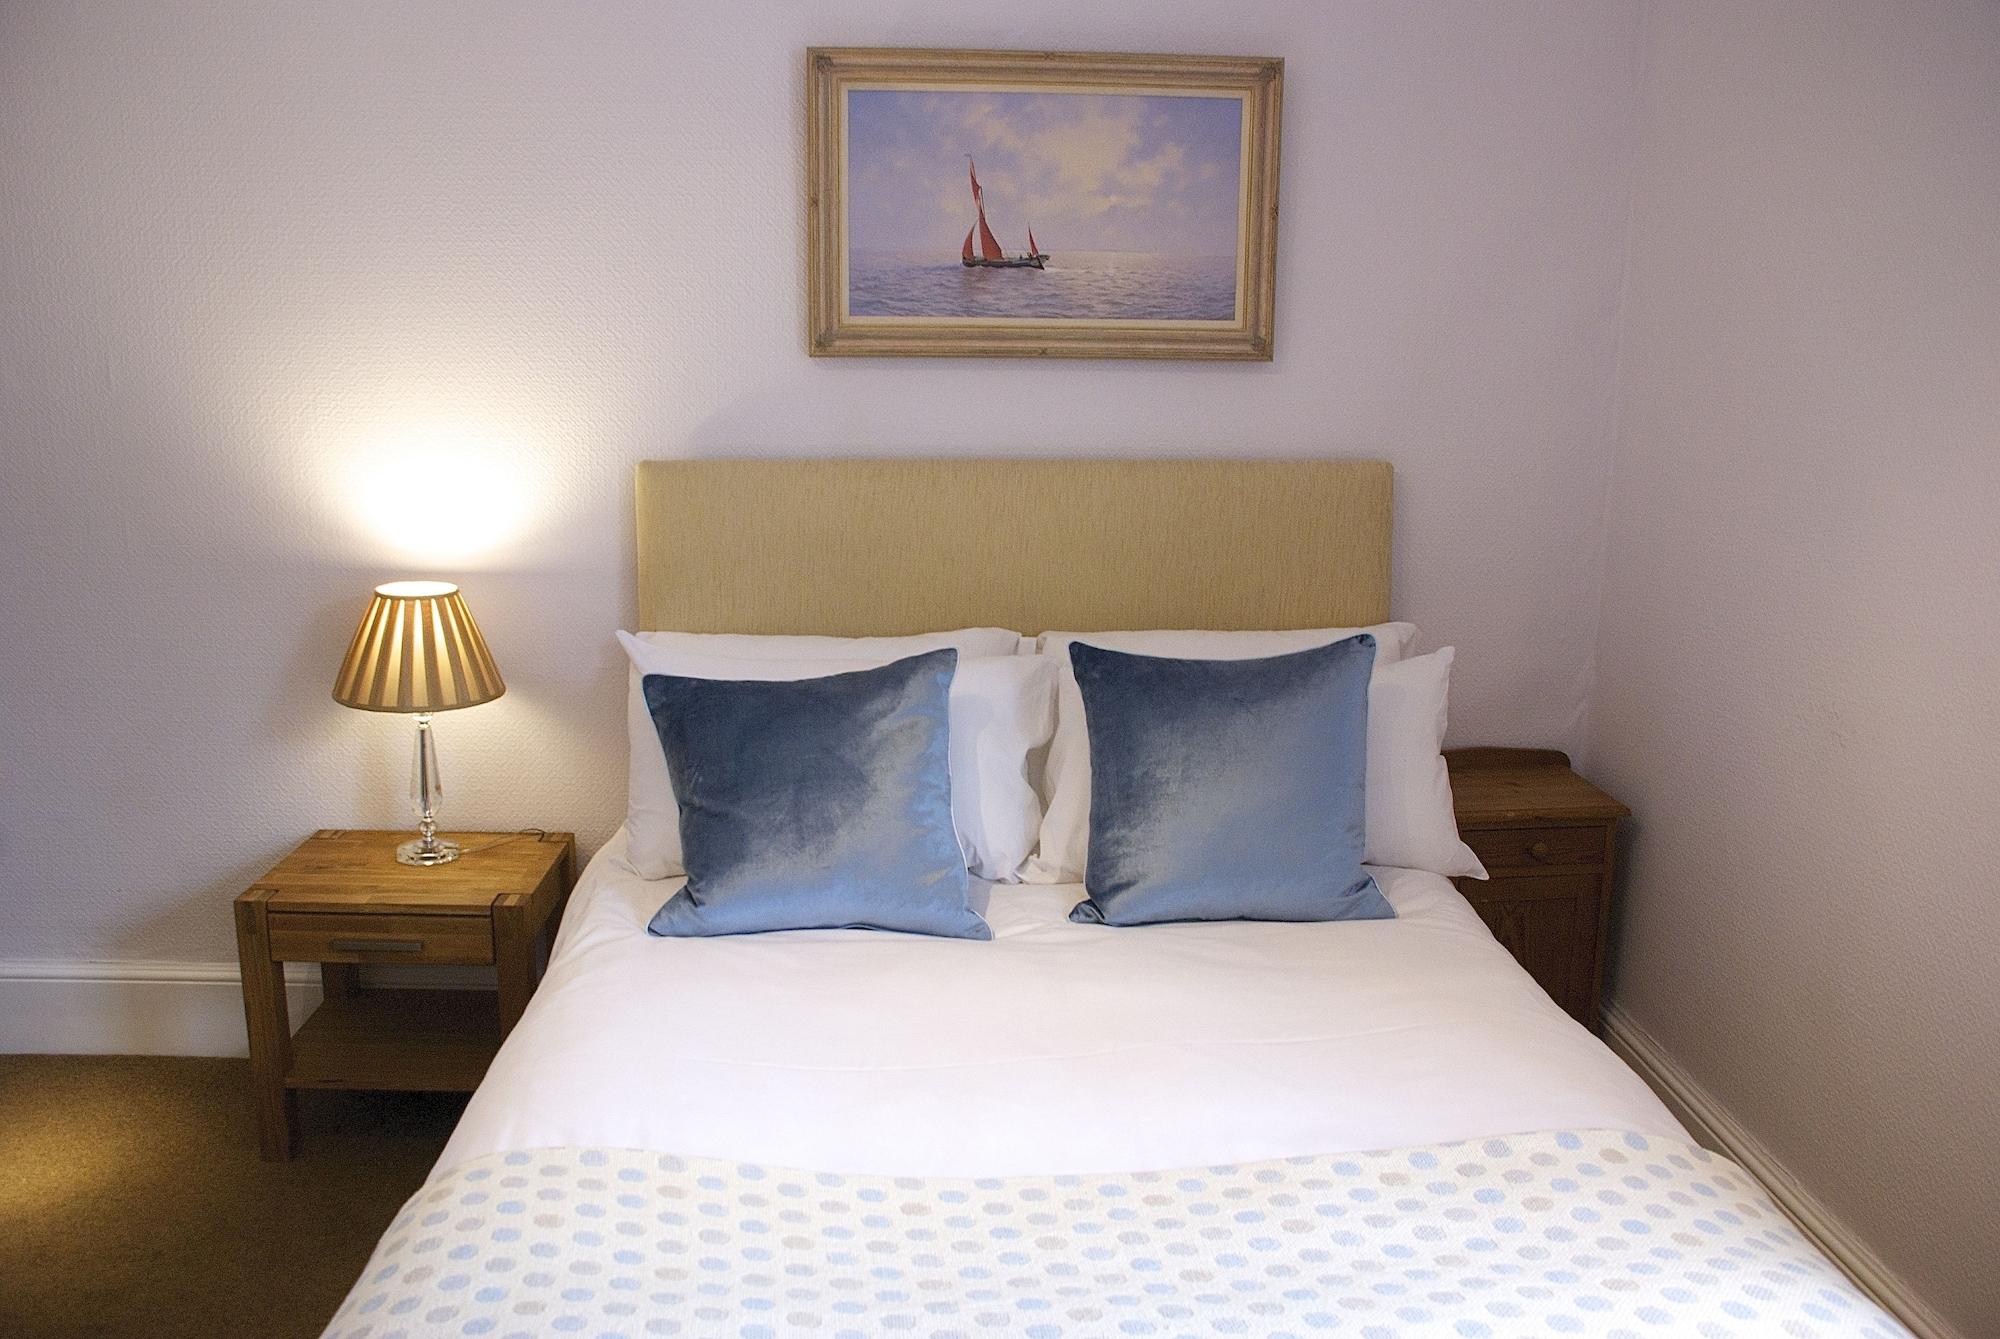 Chantry Hotel, Suffolk